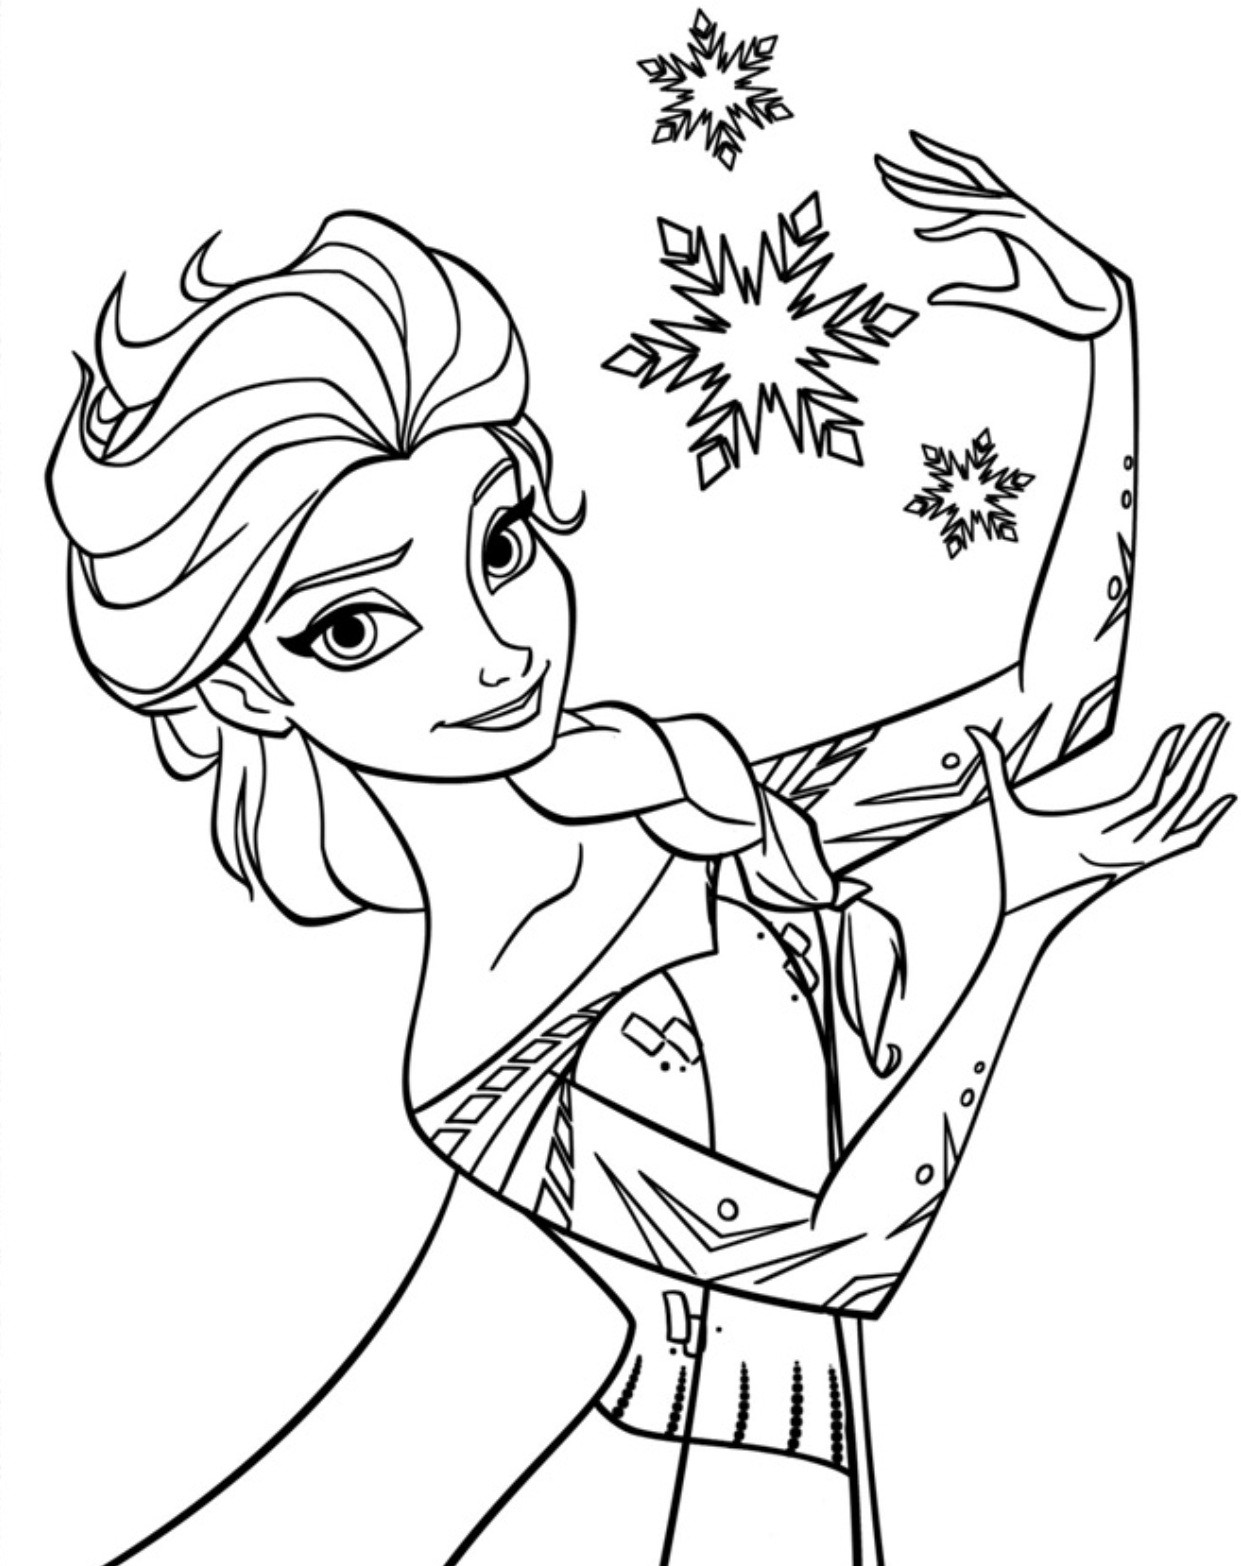 Elsa Coloring Sheet  Free Printable Elsa Coloring Pages for Kids Best